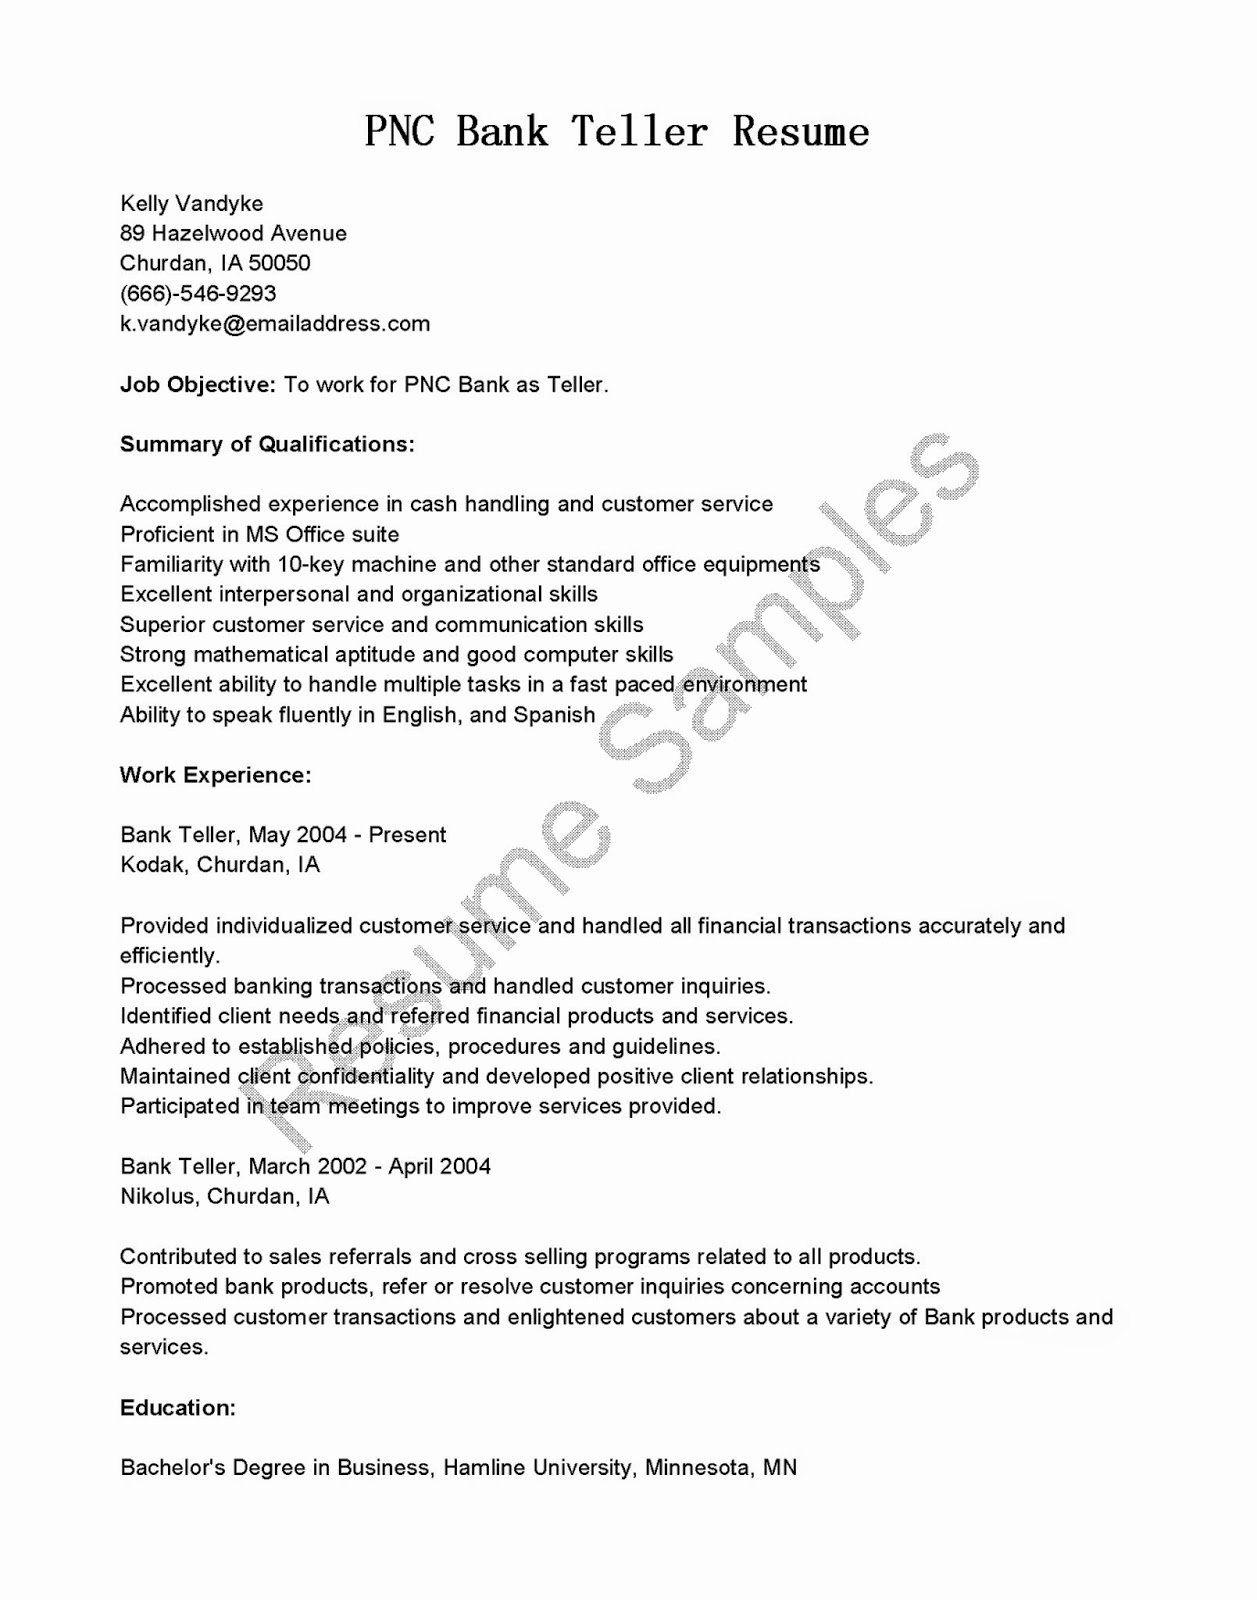 Bank Teller Resume Description Luxury Resume Samples Pnc Bank